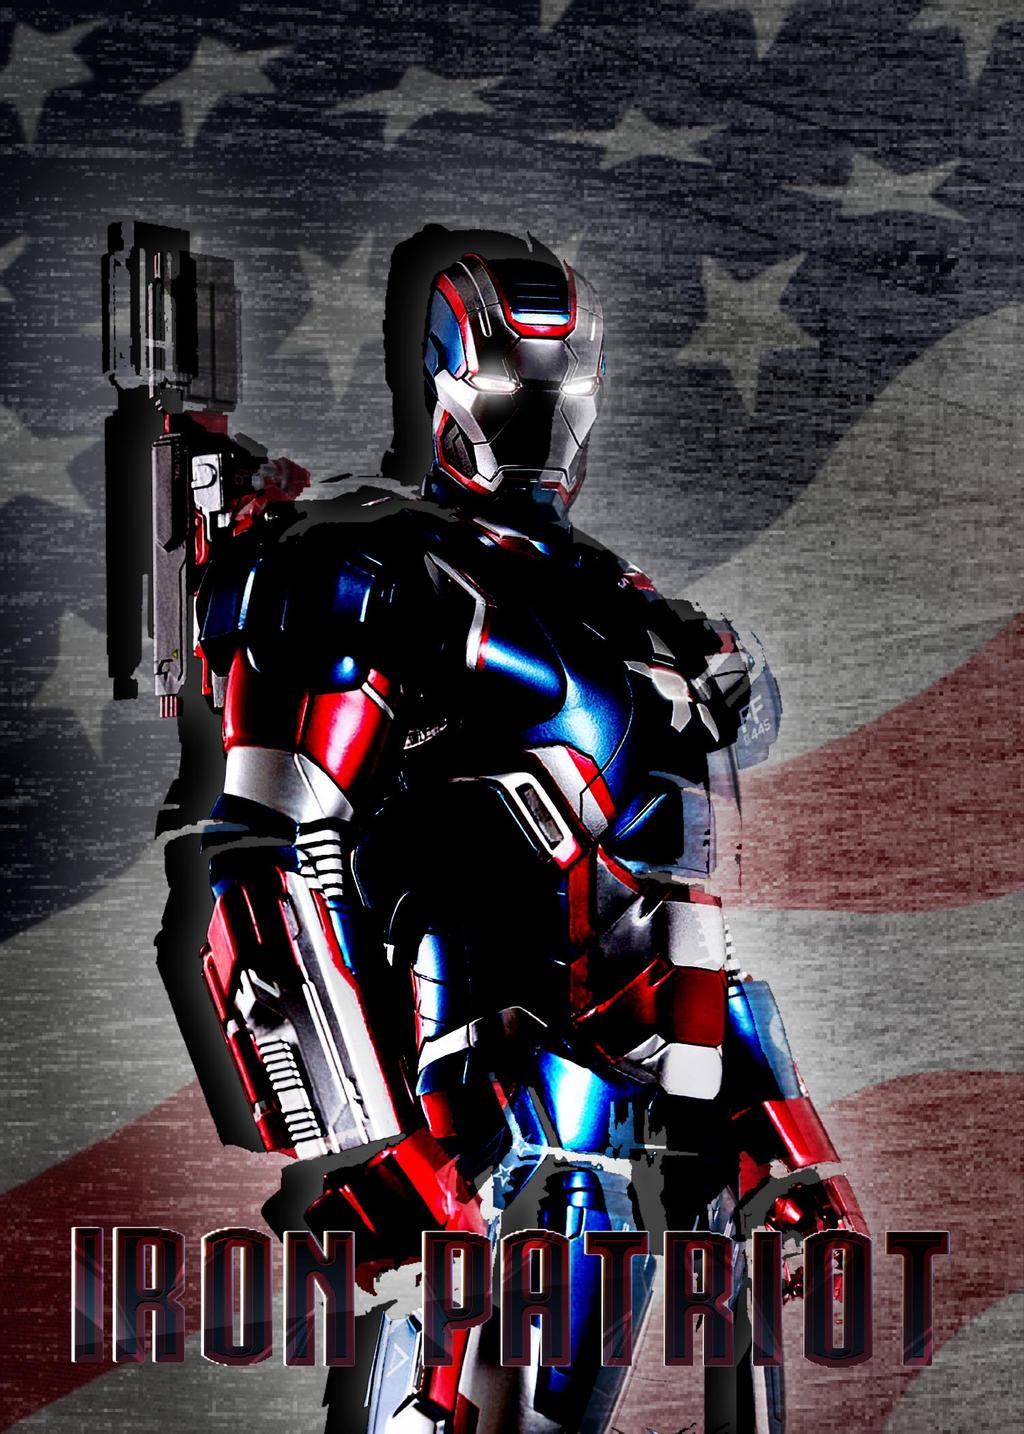 Iron Patriot by pokefan514 on DeviantArt